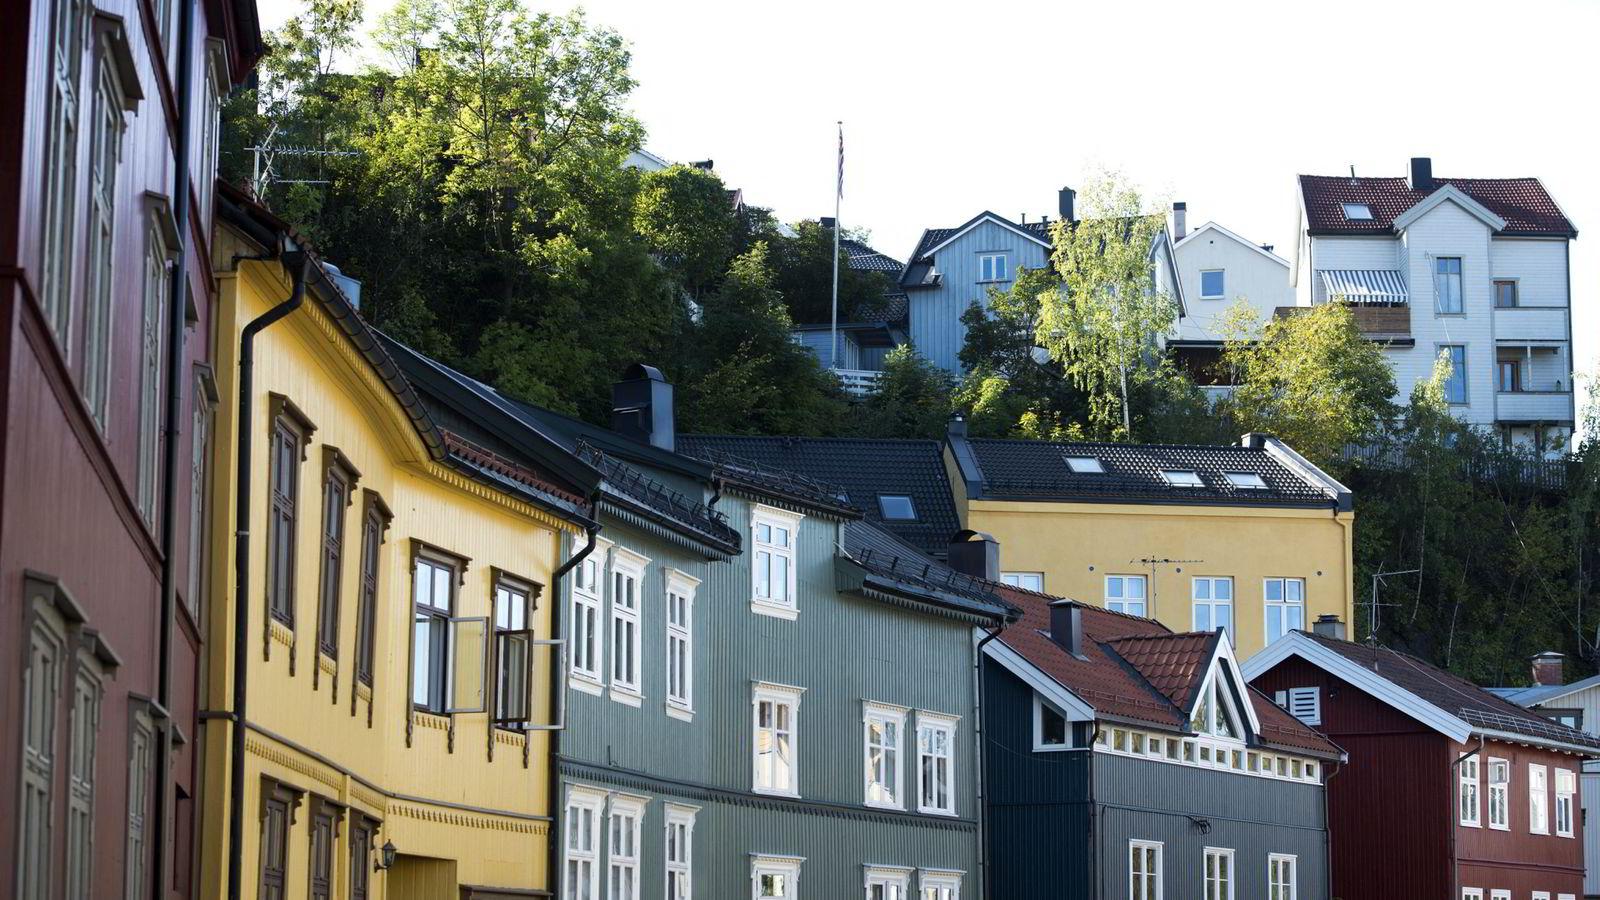 Trehusbebyggelse i Konows gate, Gamlebyen, Oslo.